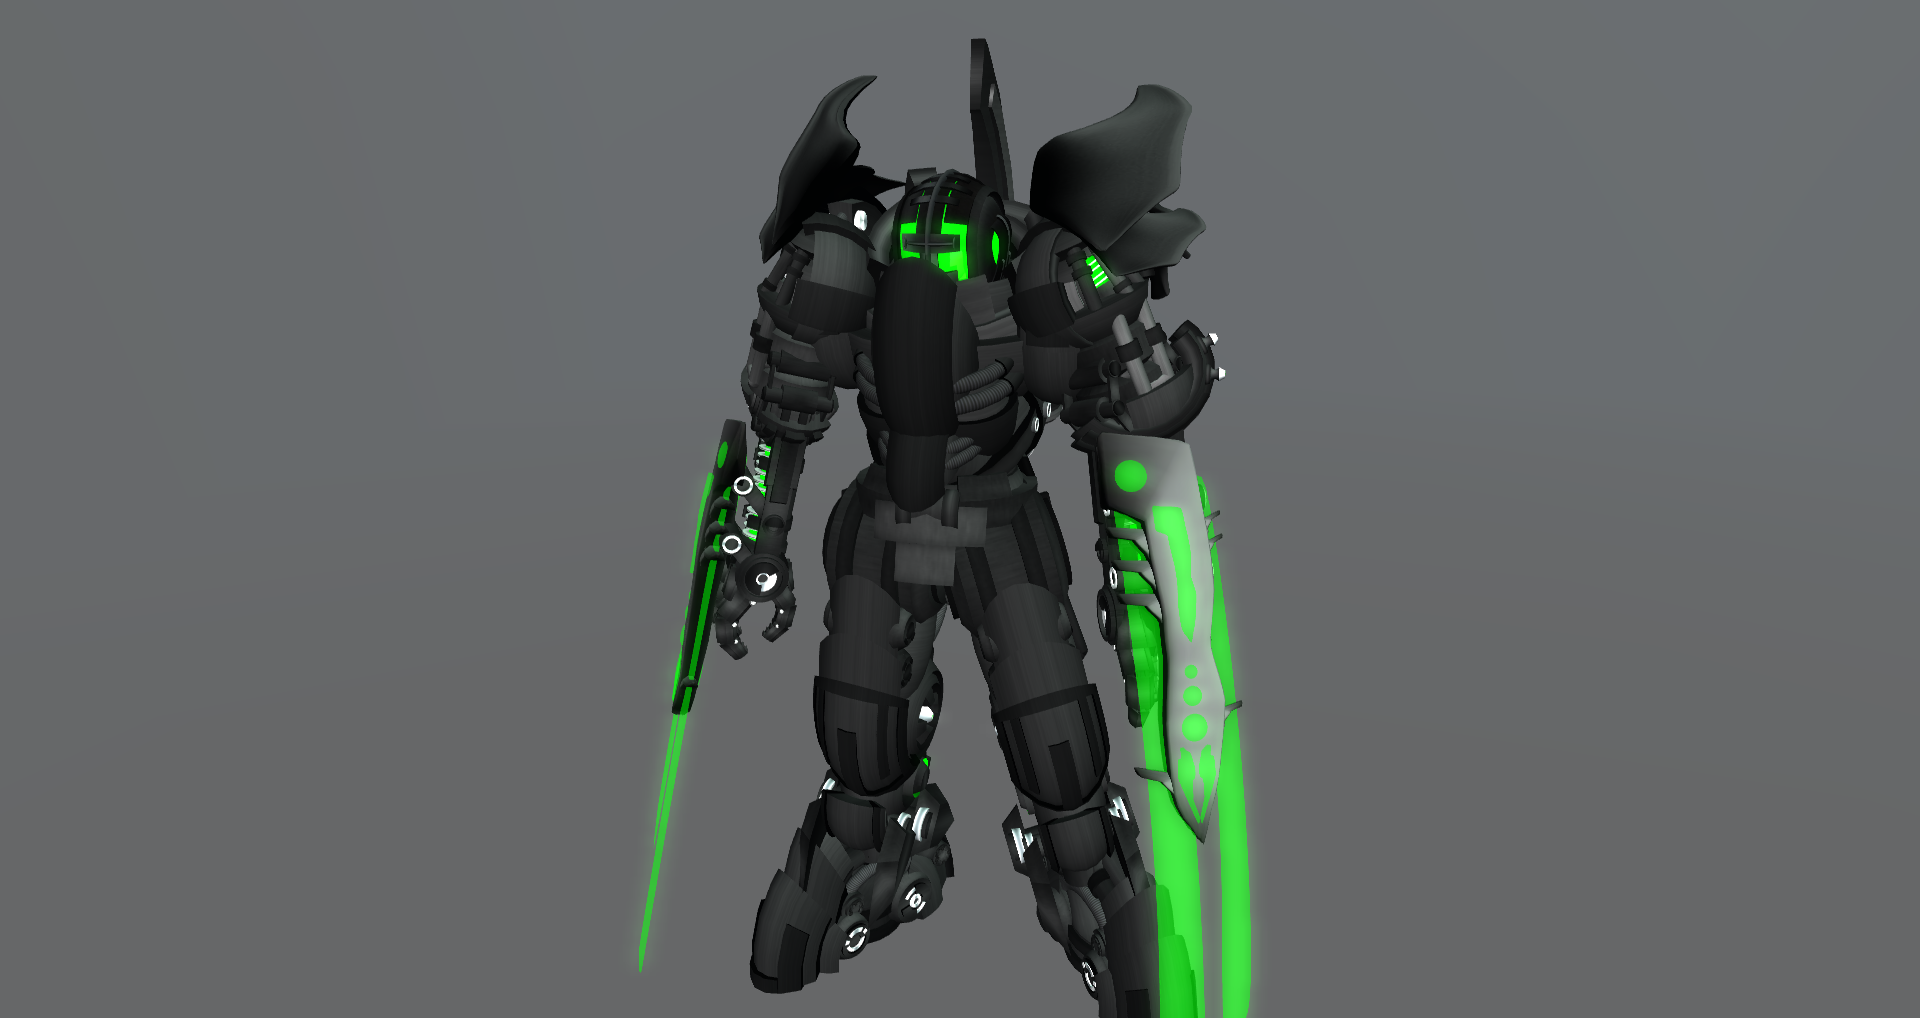 3D Futuristic Armor Suit 3 by Zarthak on DeviantArt